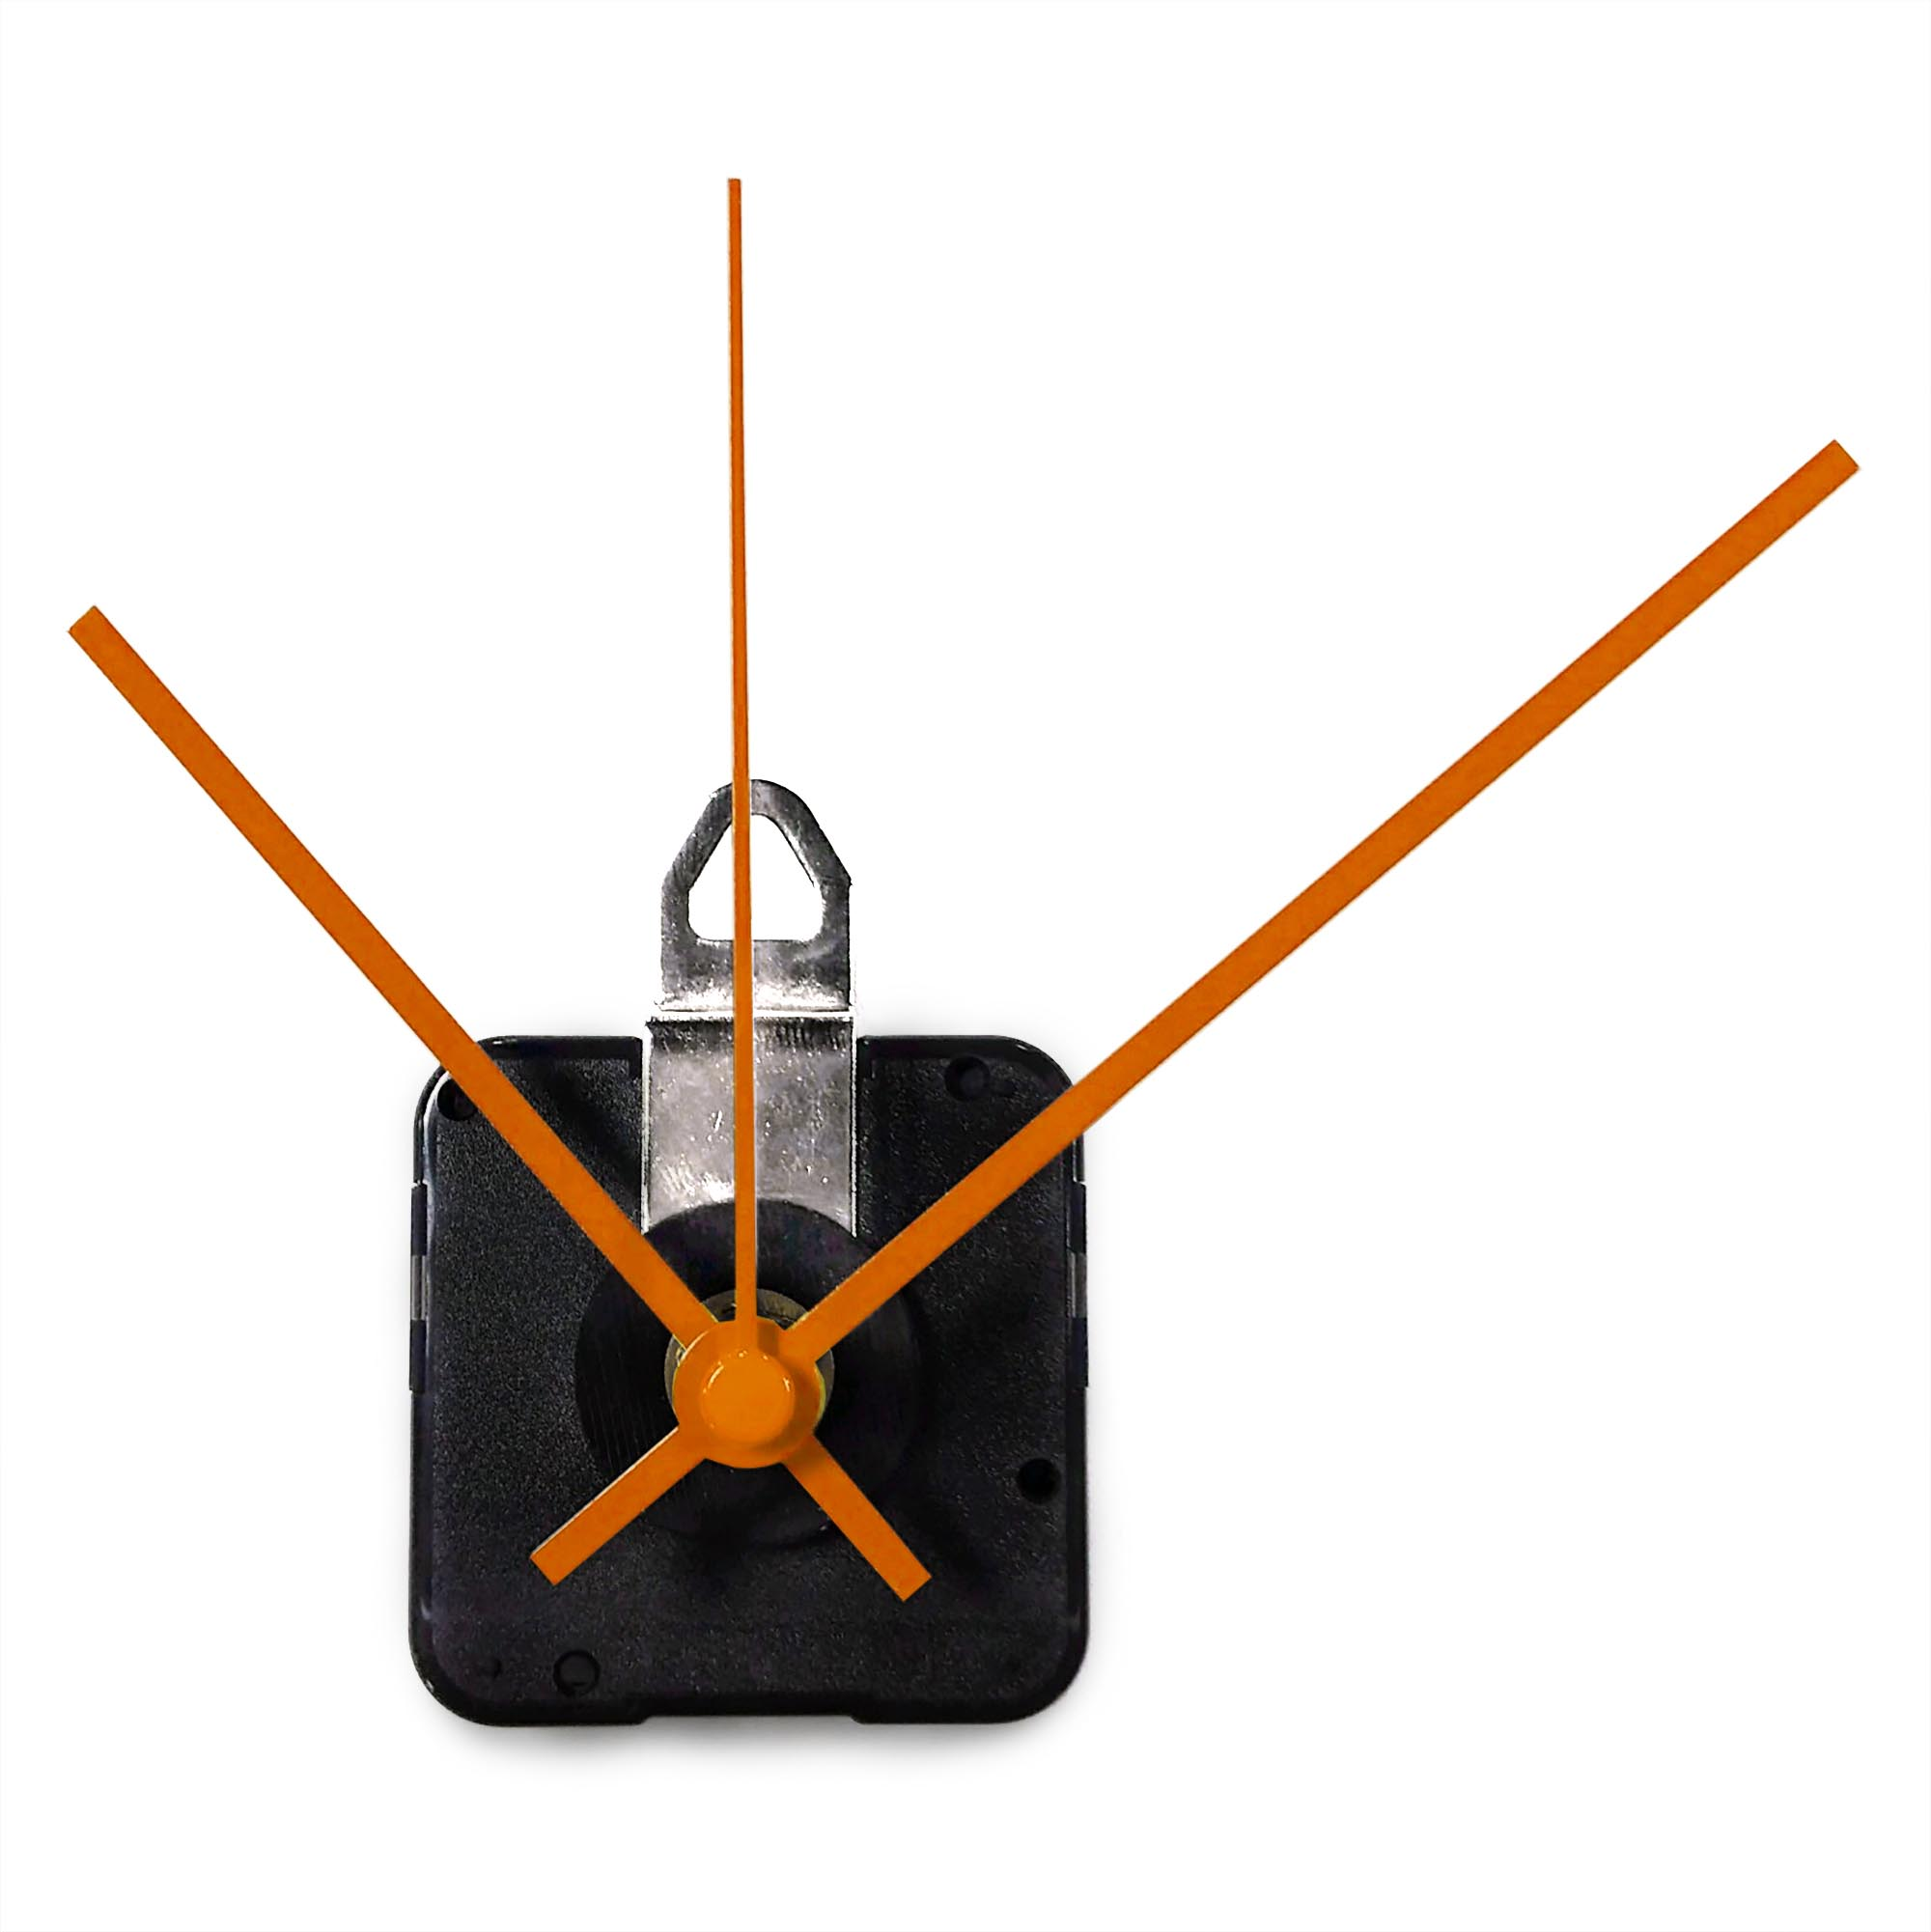 Replacement Clock Motor & Hands Set   Continuous-Sweep, High-Torque Mini Quartz Movement (Modern Style Hands) - AC0001-MOD